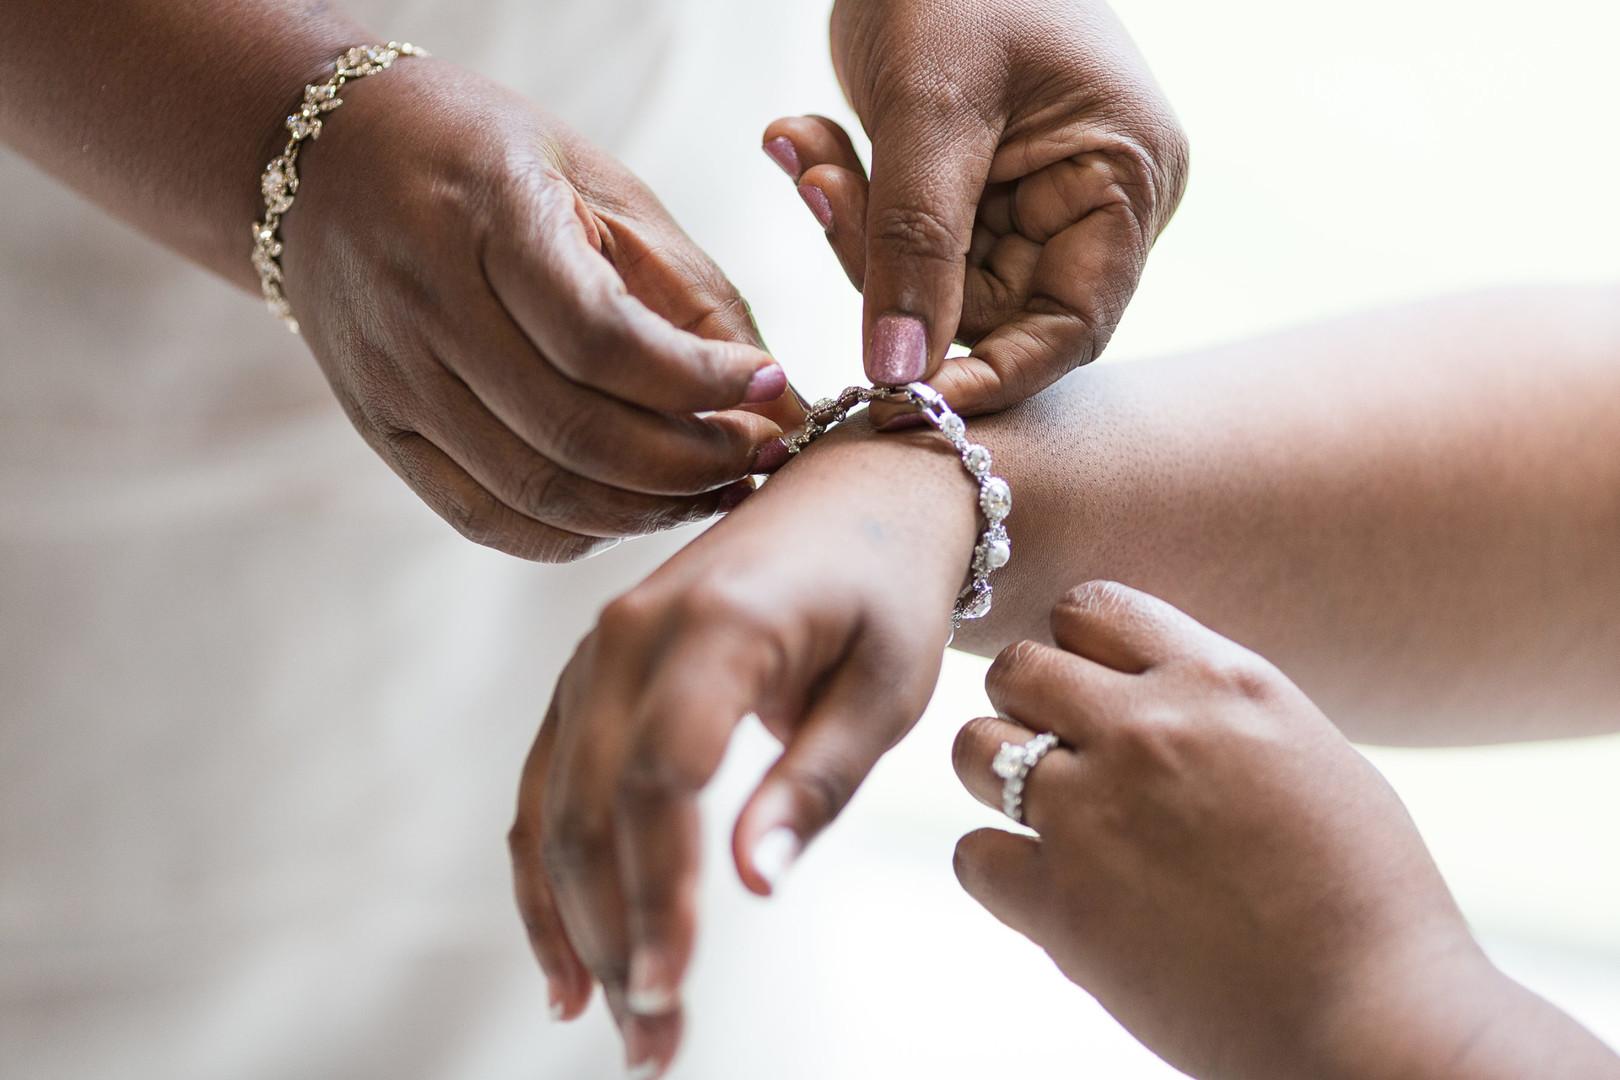 mom putting on bride's wedding jewelry